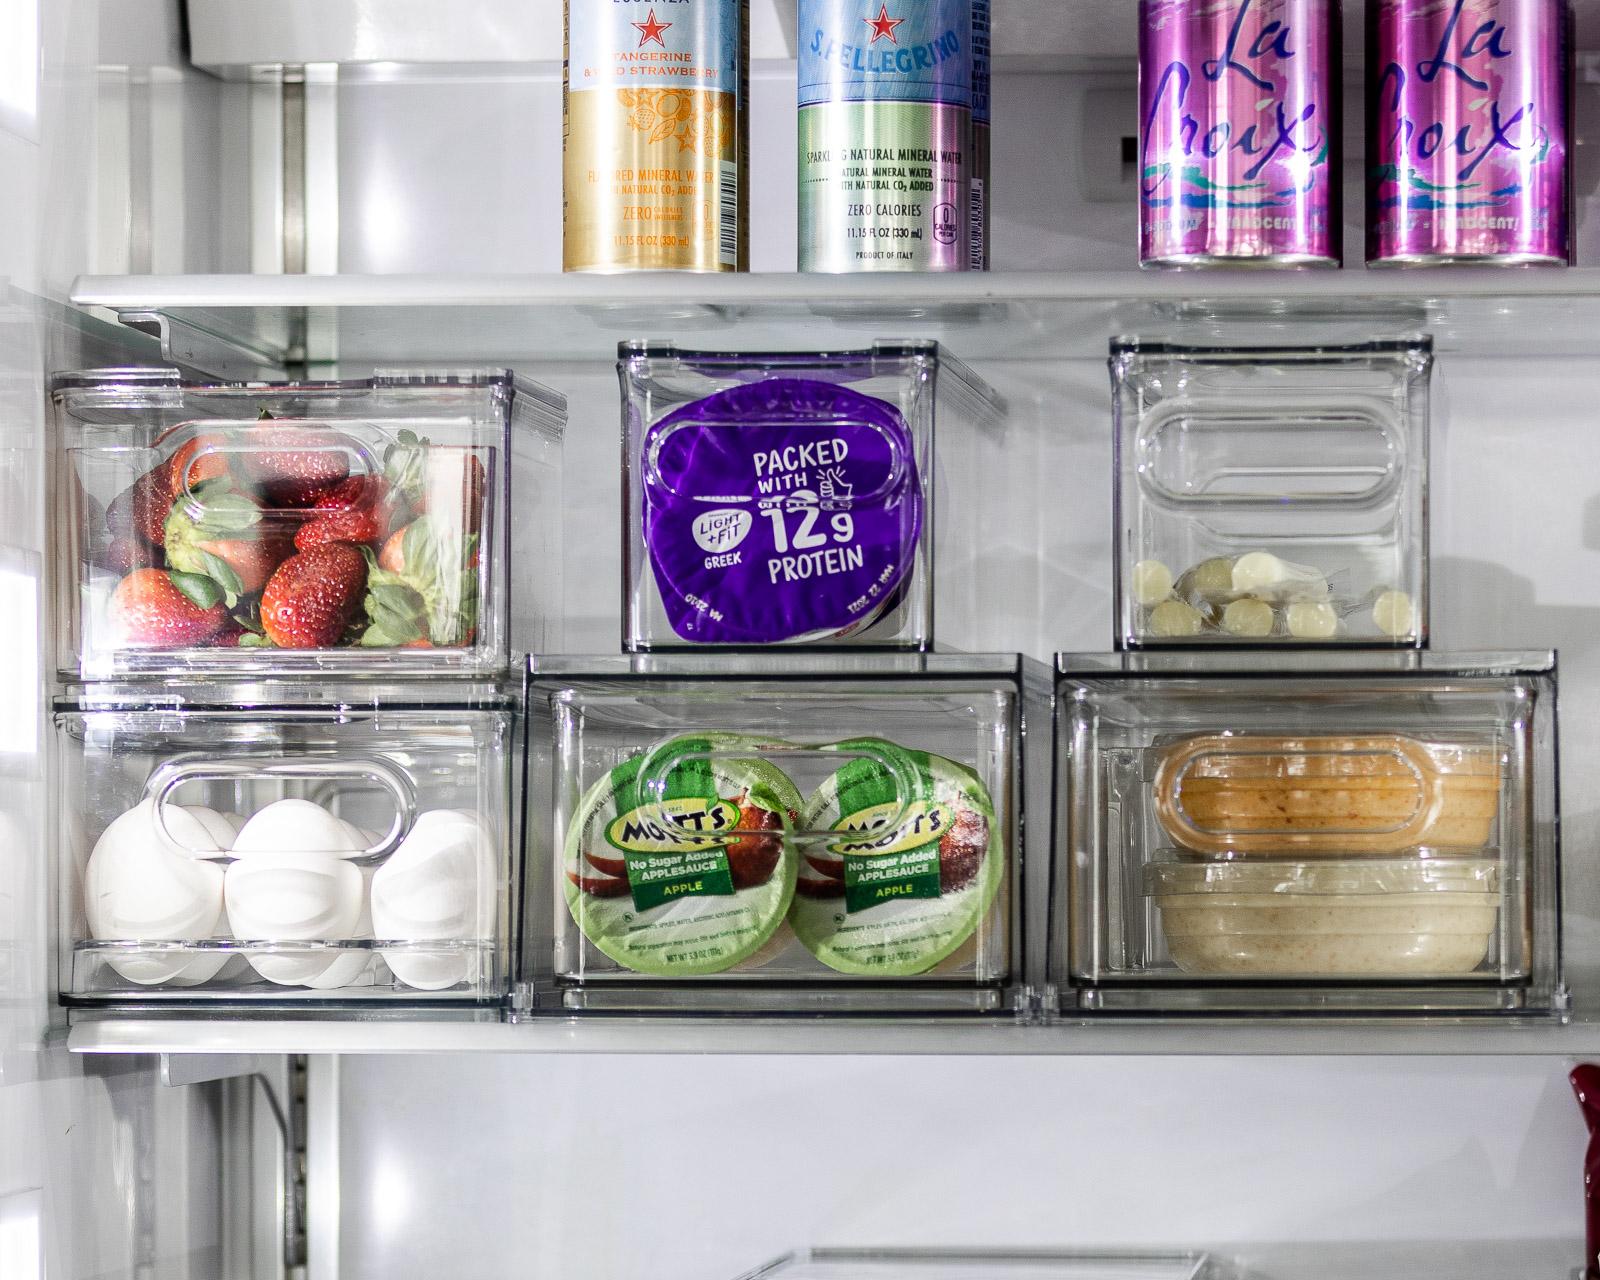 yogurt-fruit-and-snack-storage-for-refrigerator-The-Glamorous-Gal